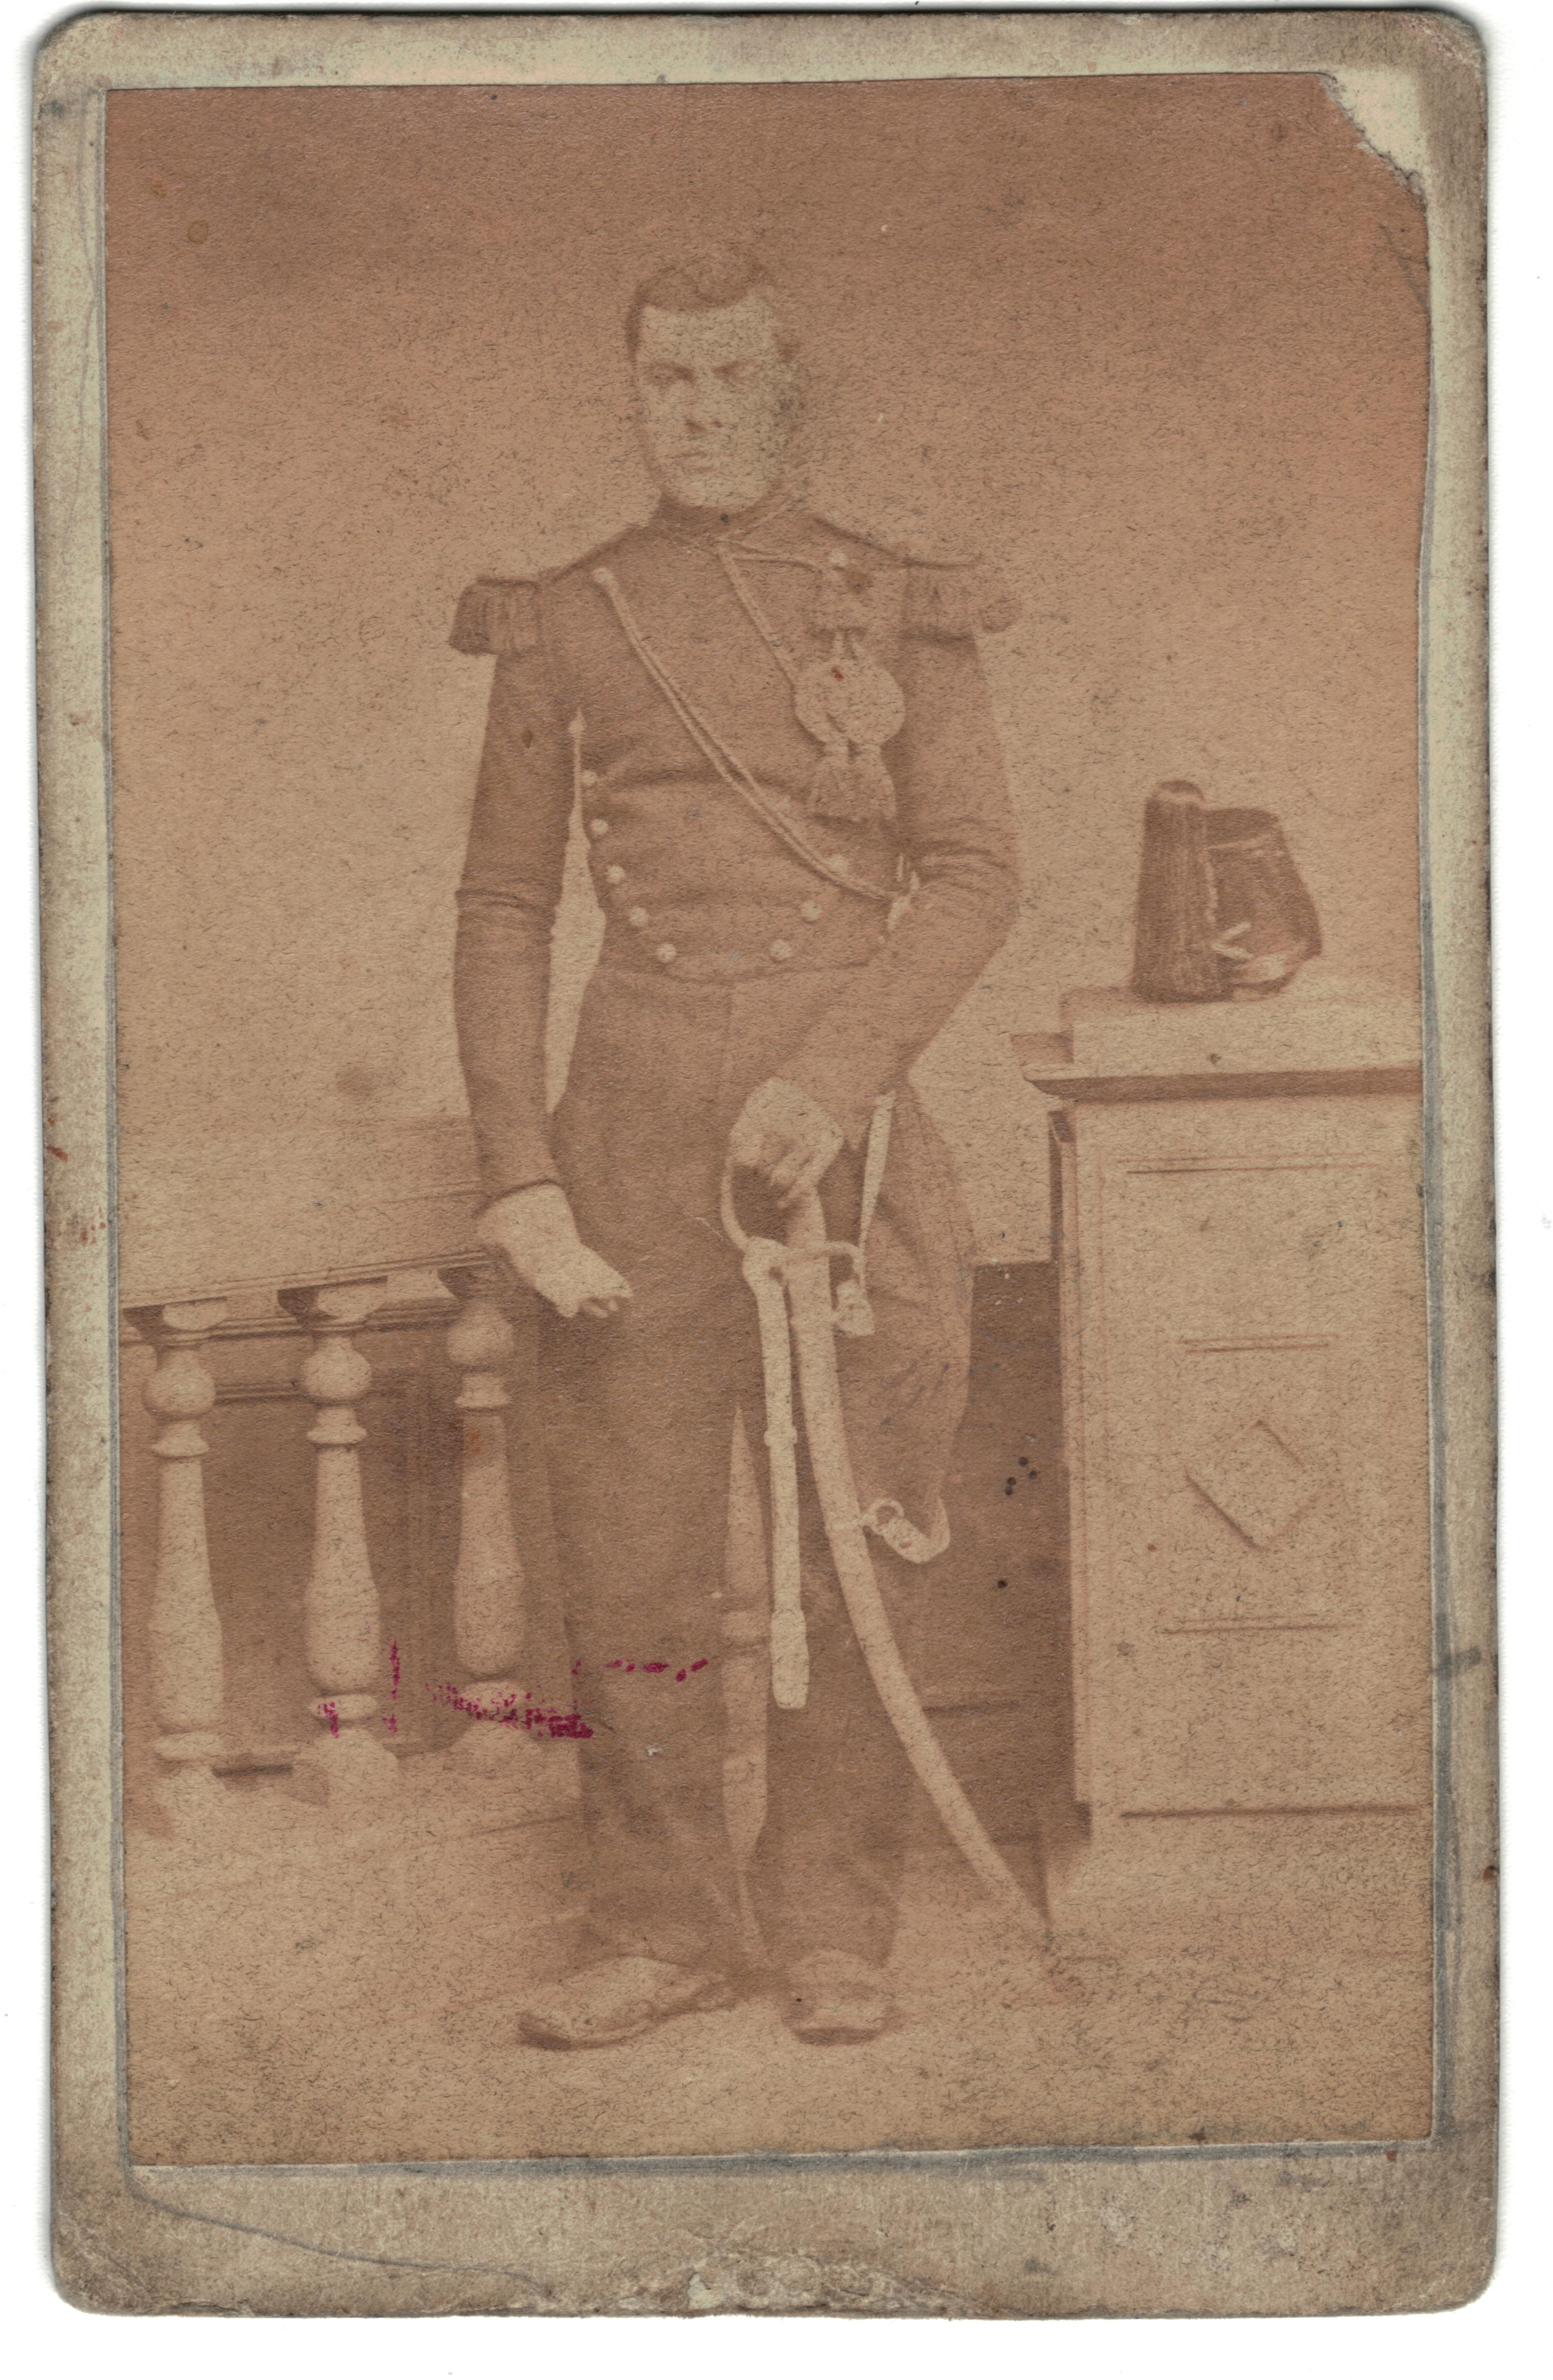 CDV Soldat Français - Artilleur - Uniforme - 2nd empire - Sabre - Shako